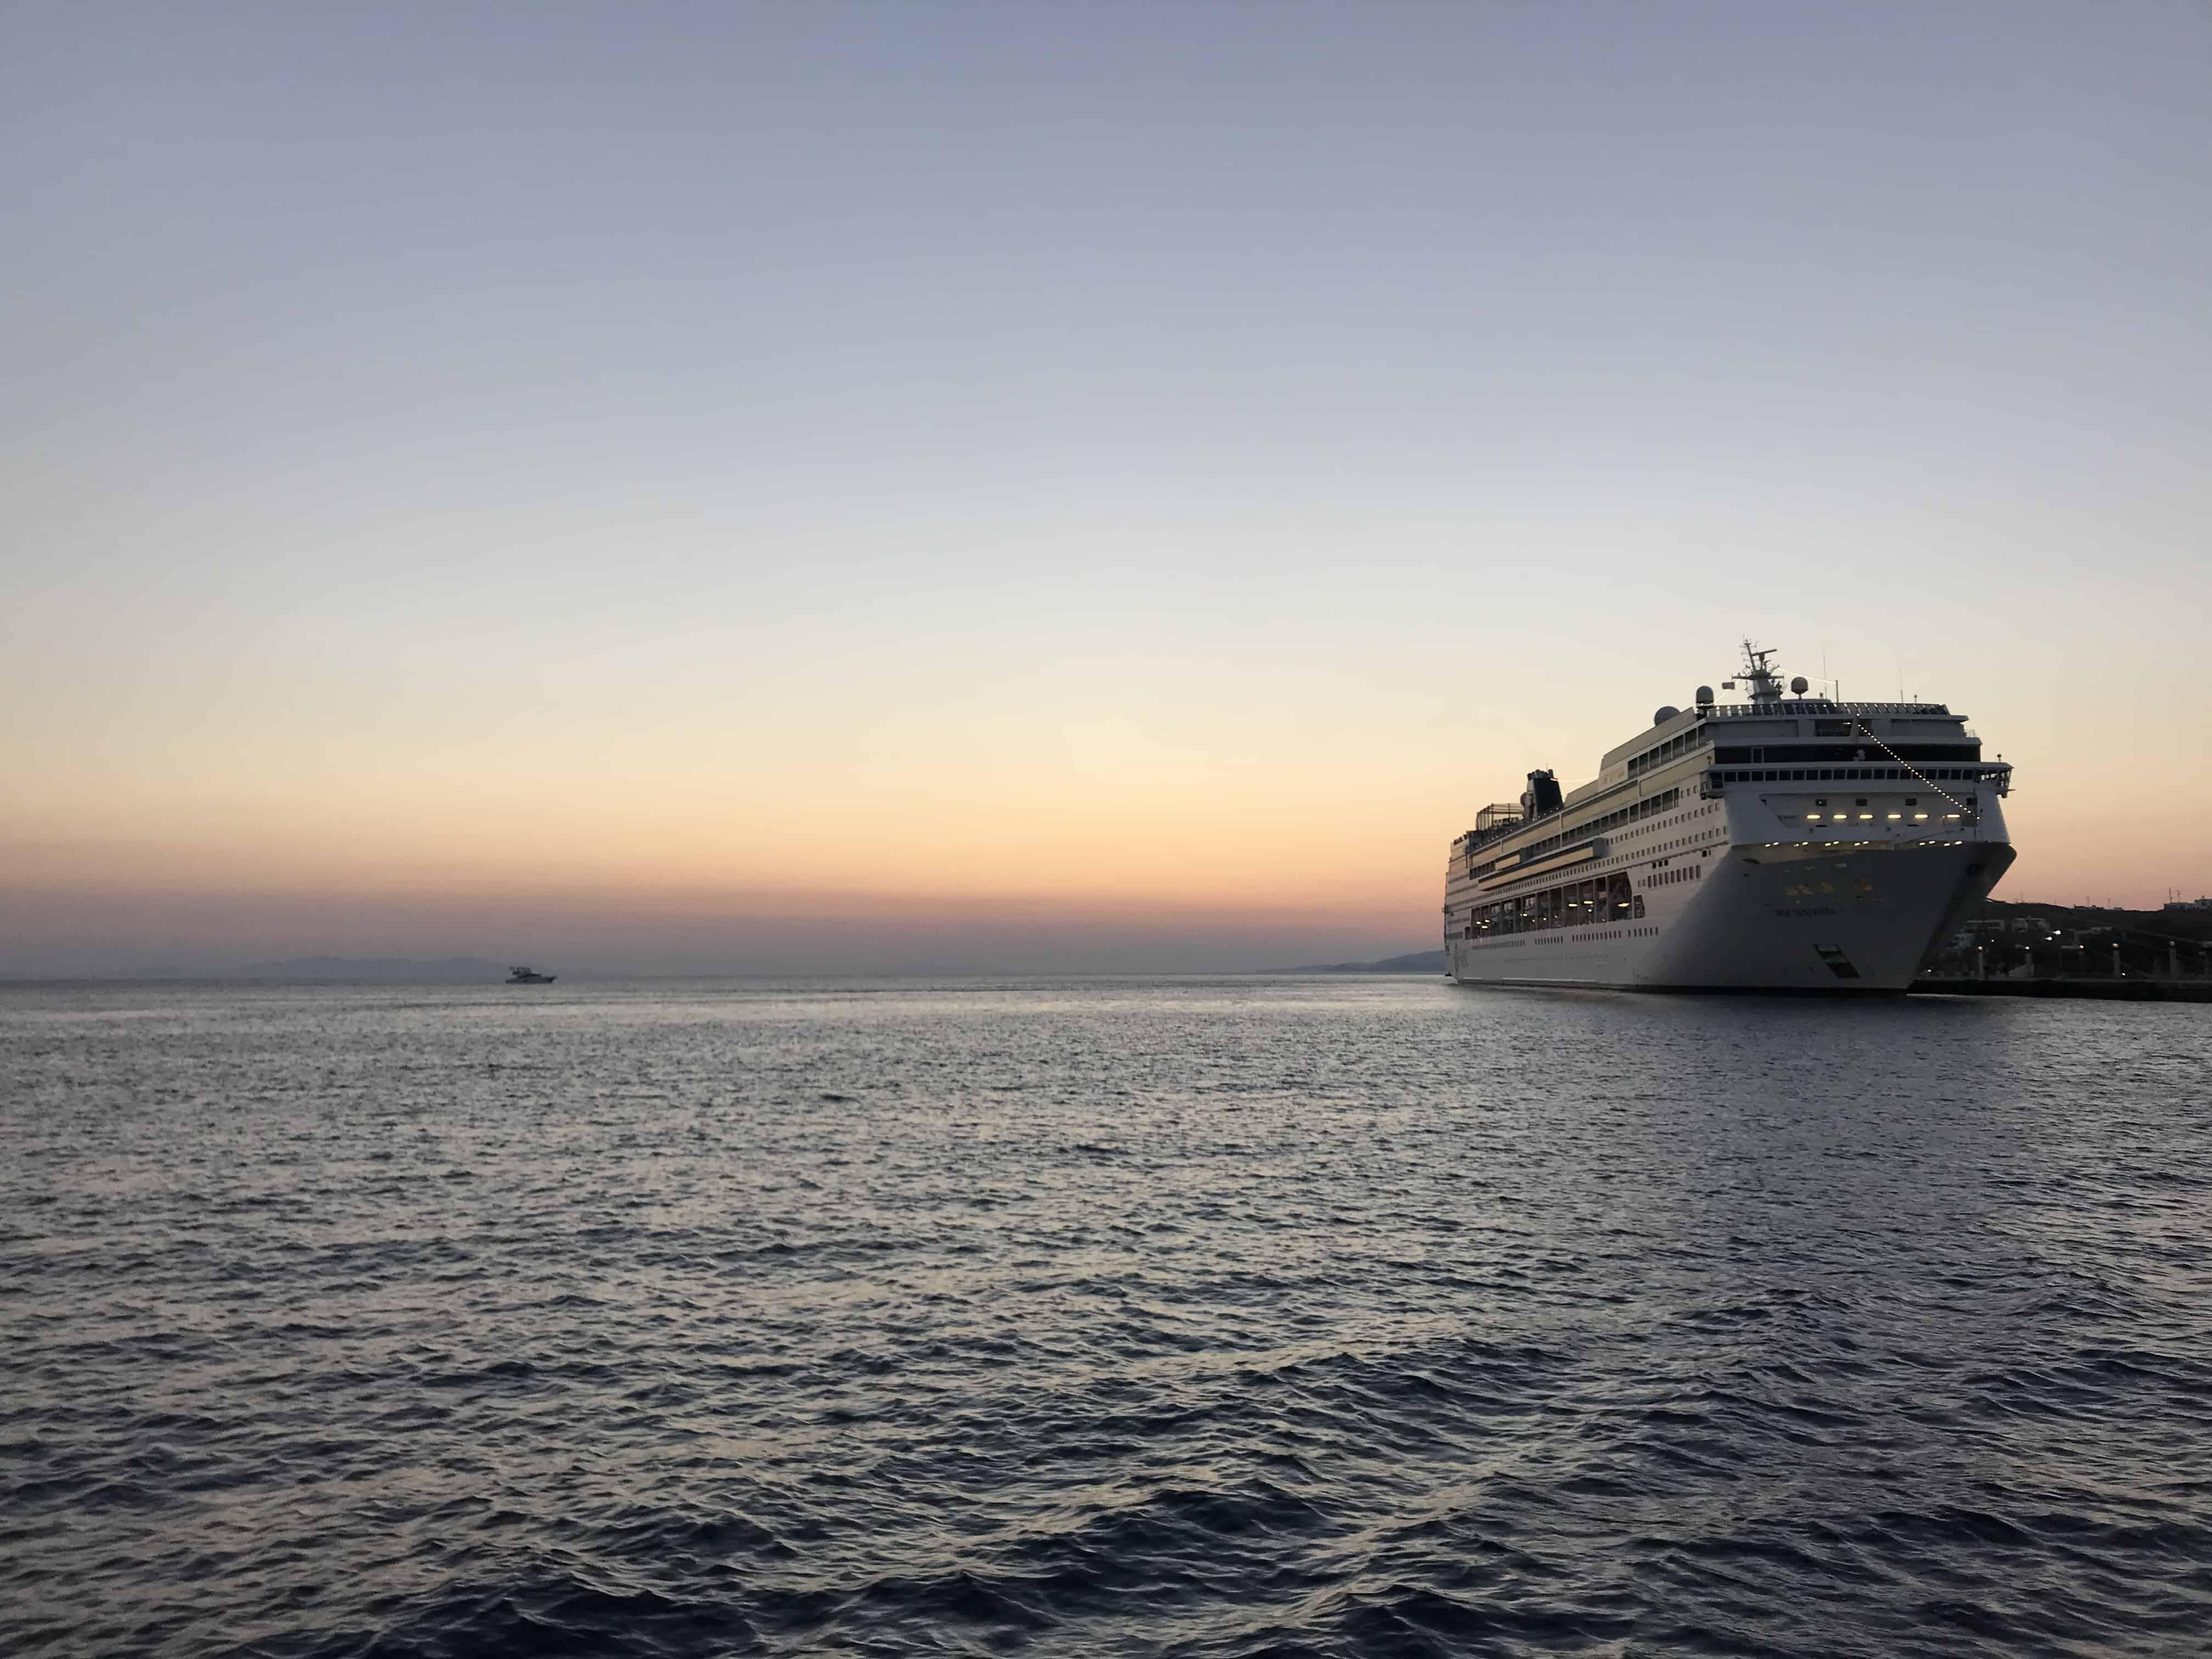 luxury cruise vacation-Mykonos by sunset